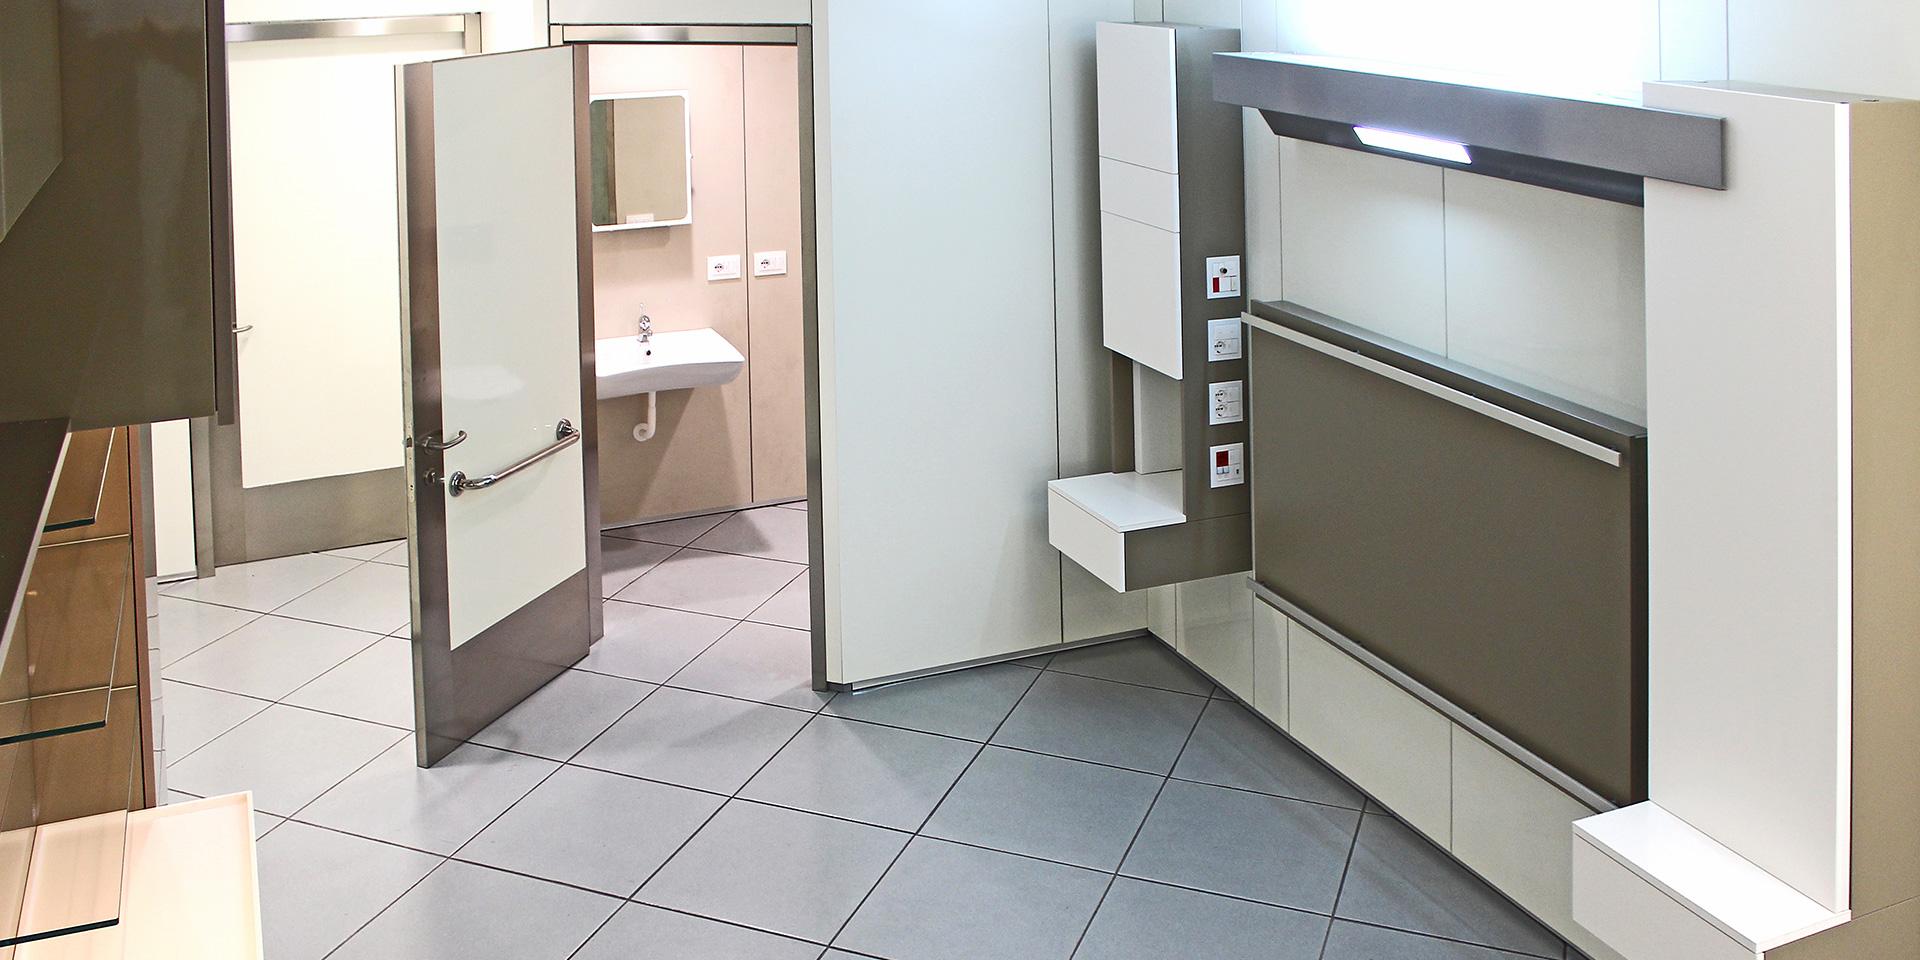 Pareti ospedaliere prefabbricate, Binini Partners, Società di architettura e ingegneria